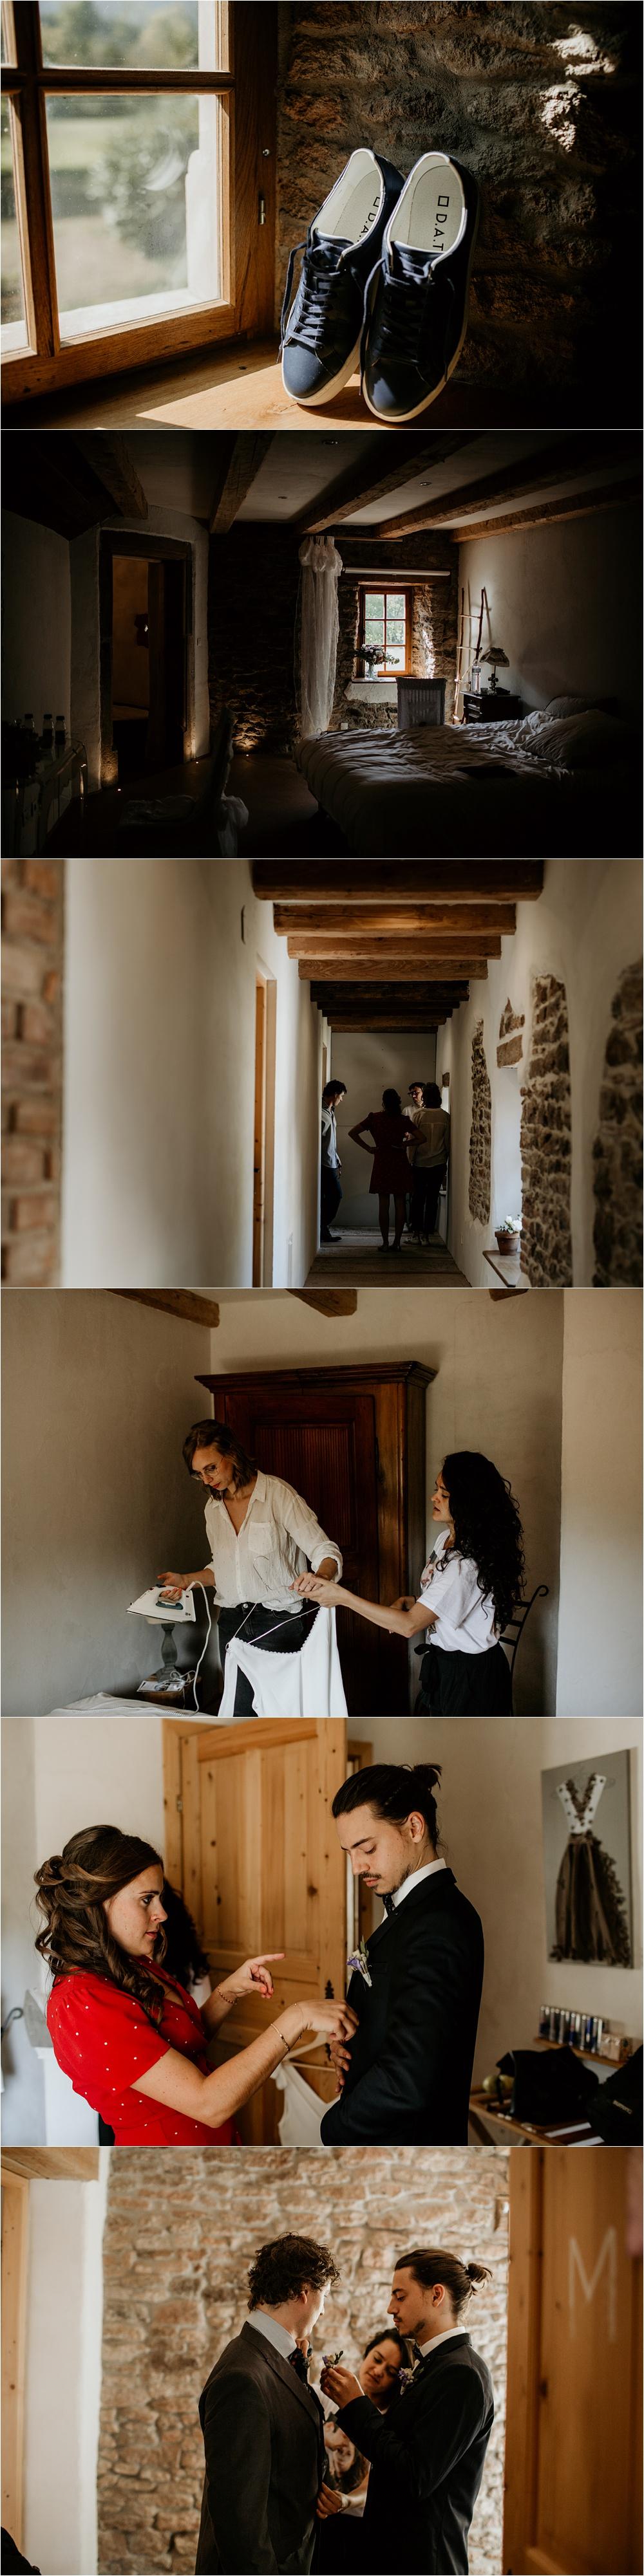 Mariage bohème folk moderne Alsace